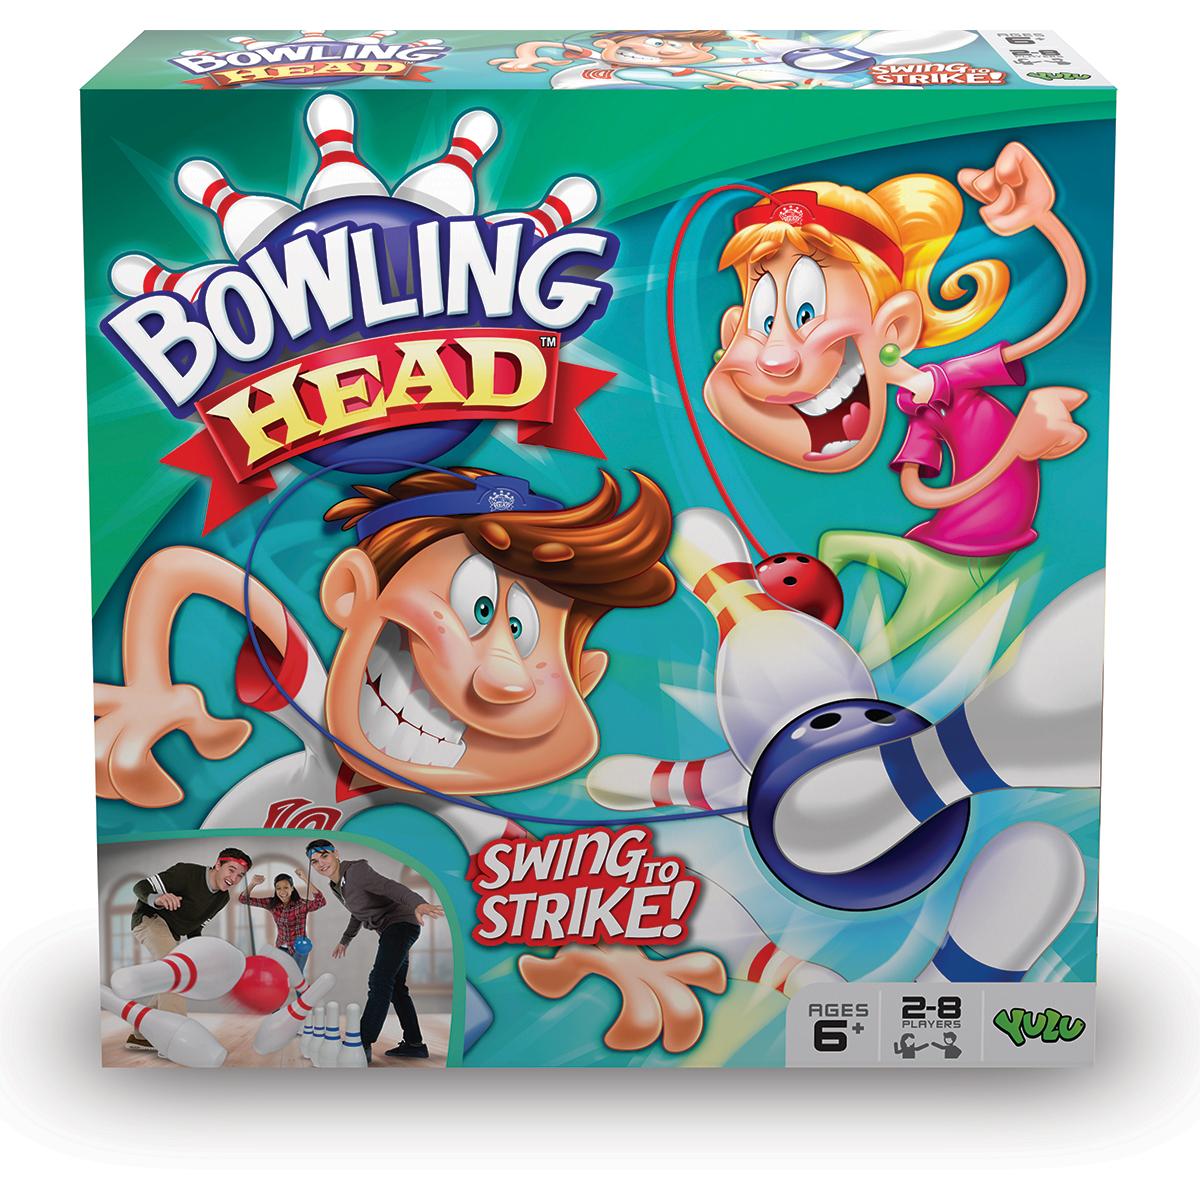 Bowling Head